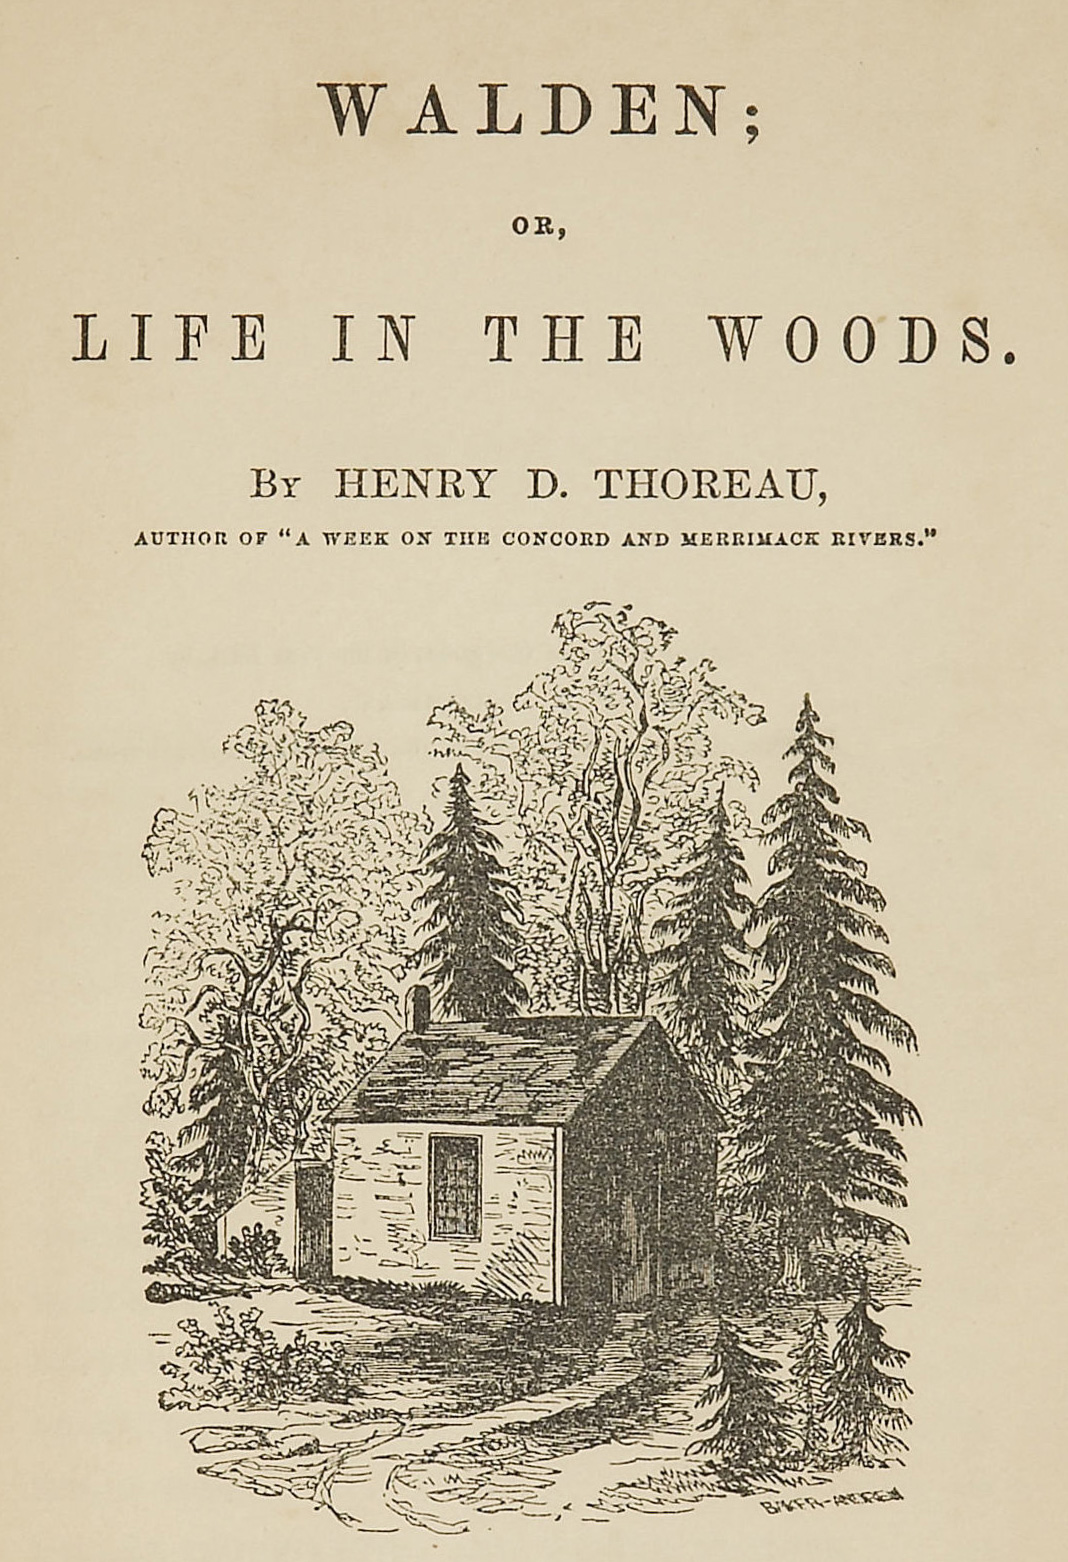 Walden, by Henry David Thoreau